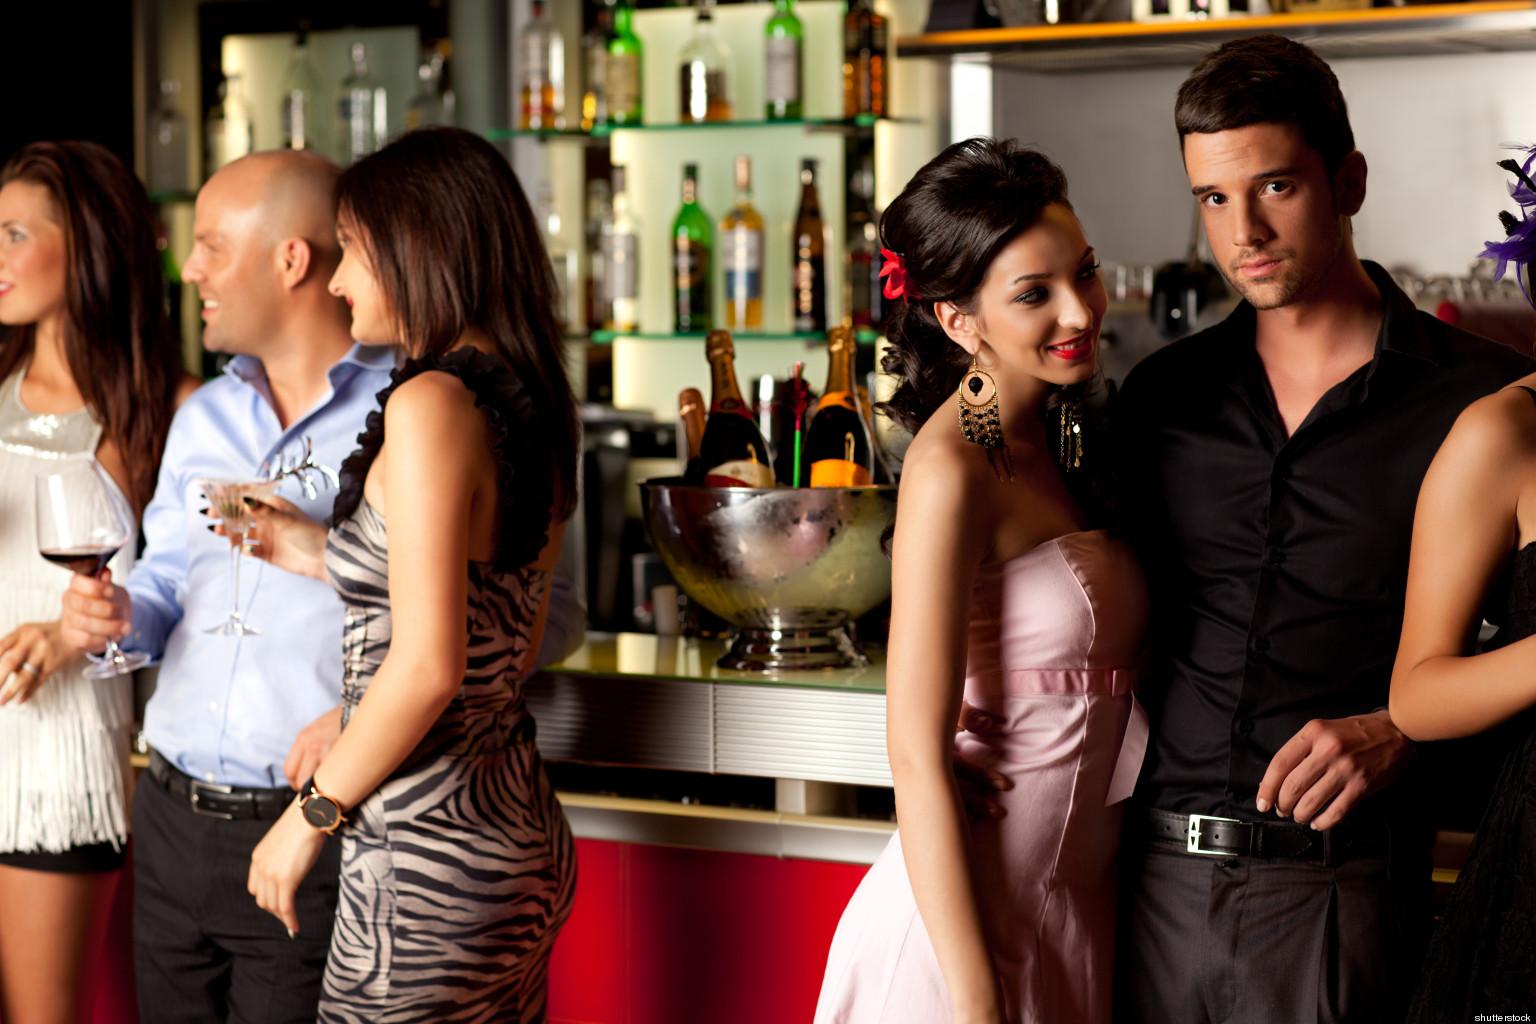 Everyday italian giadas dating tips for the bachelor